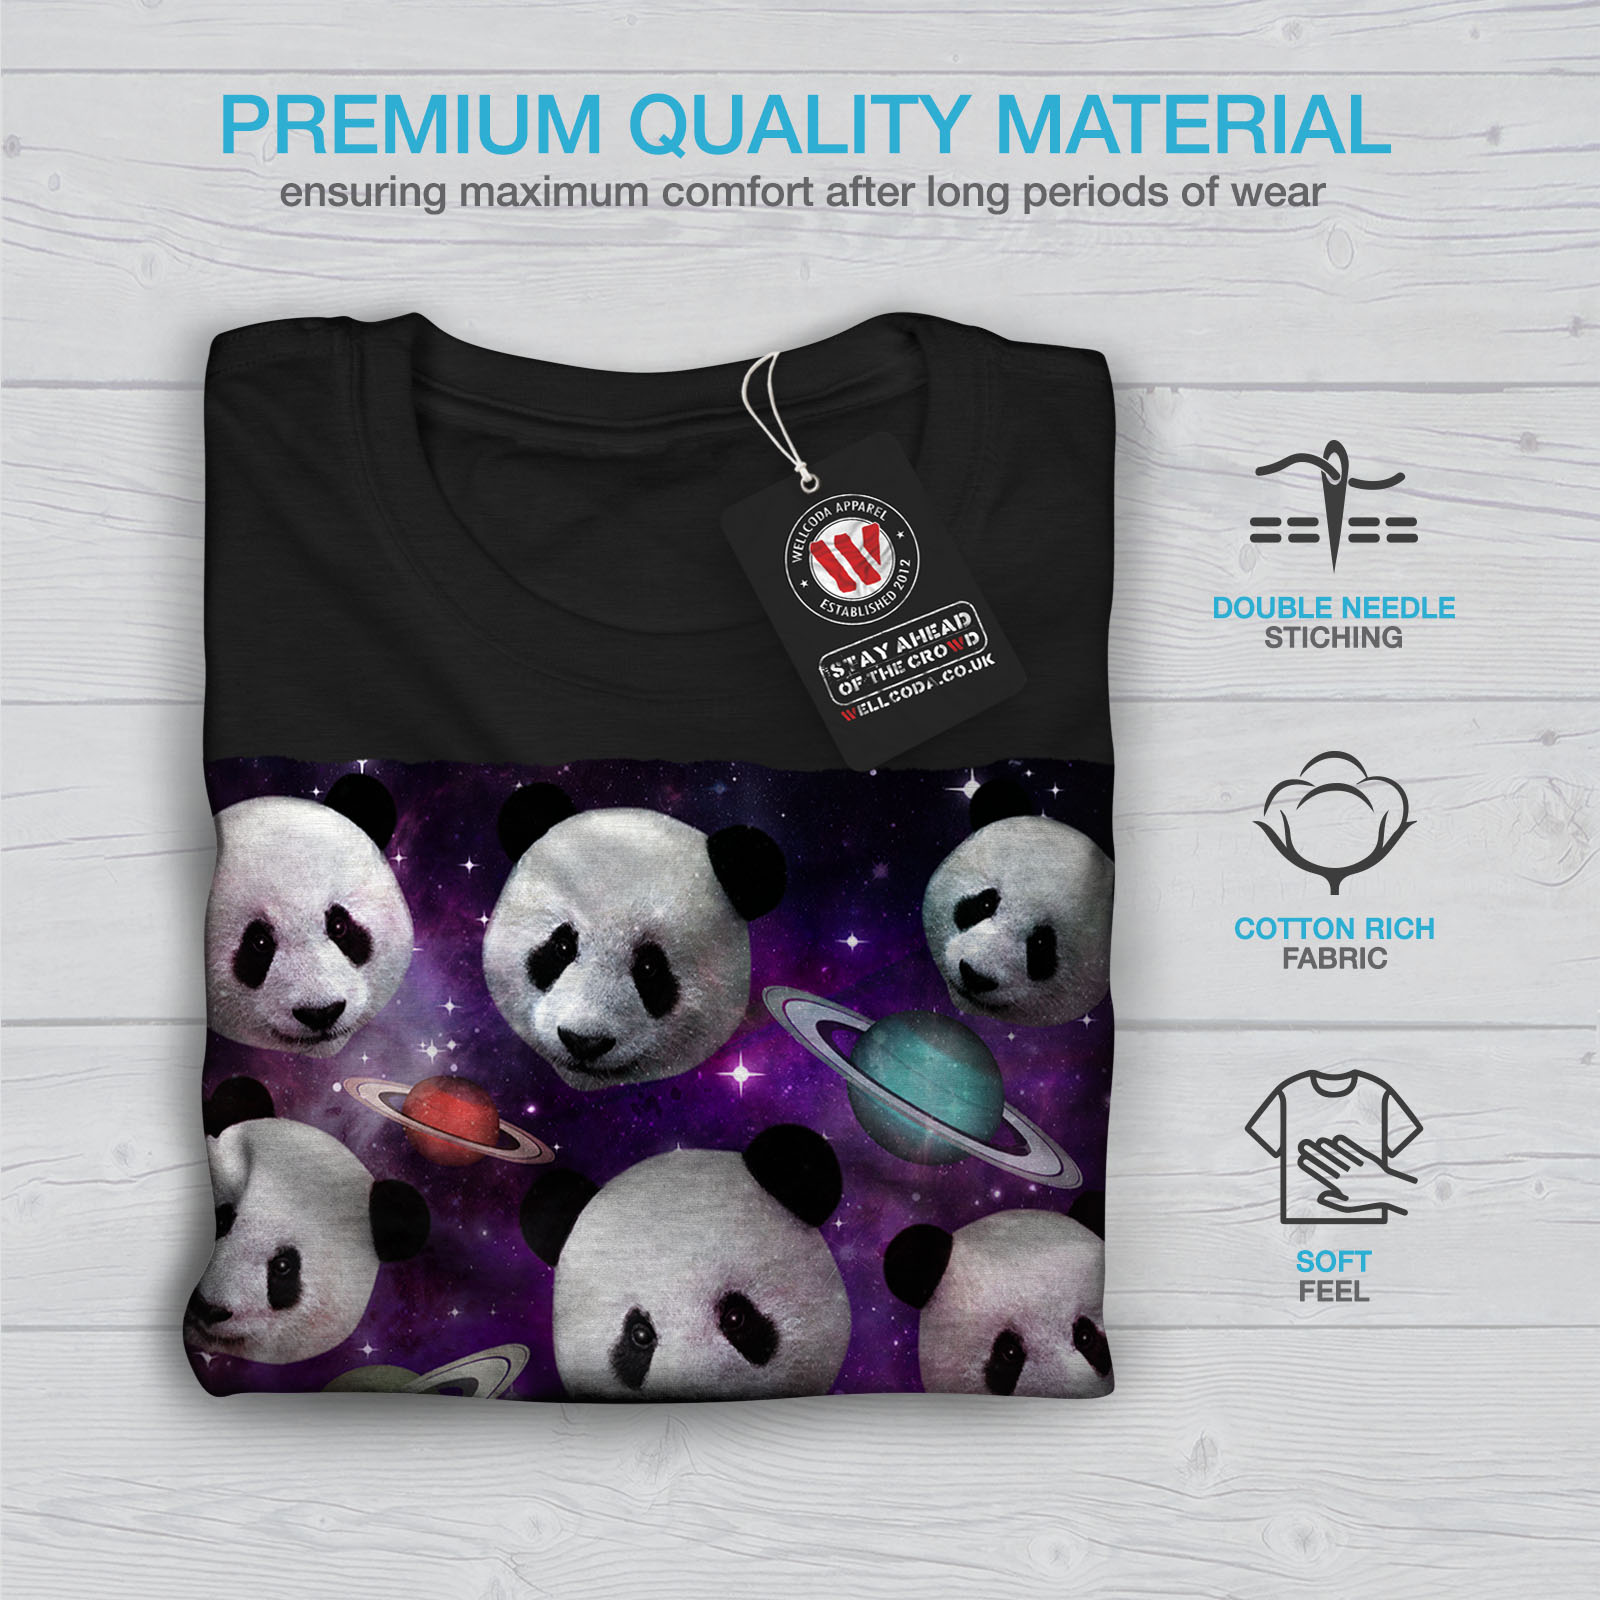 Universe Graphic Design Printed Tee Wellcoda Panda Face Space Mens T-shirt